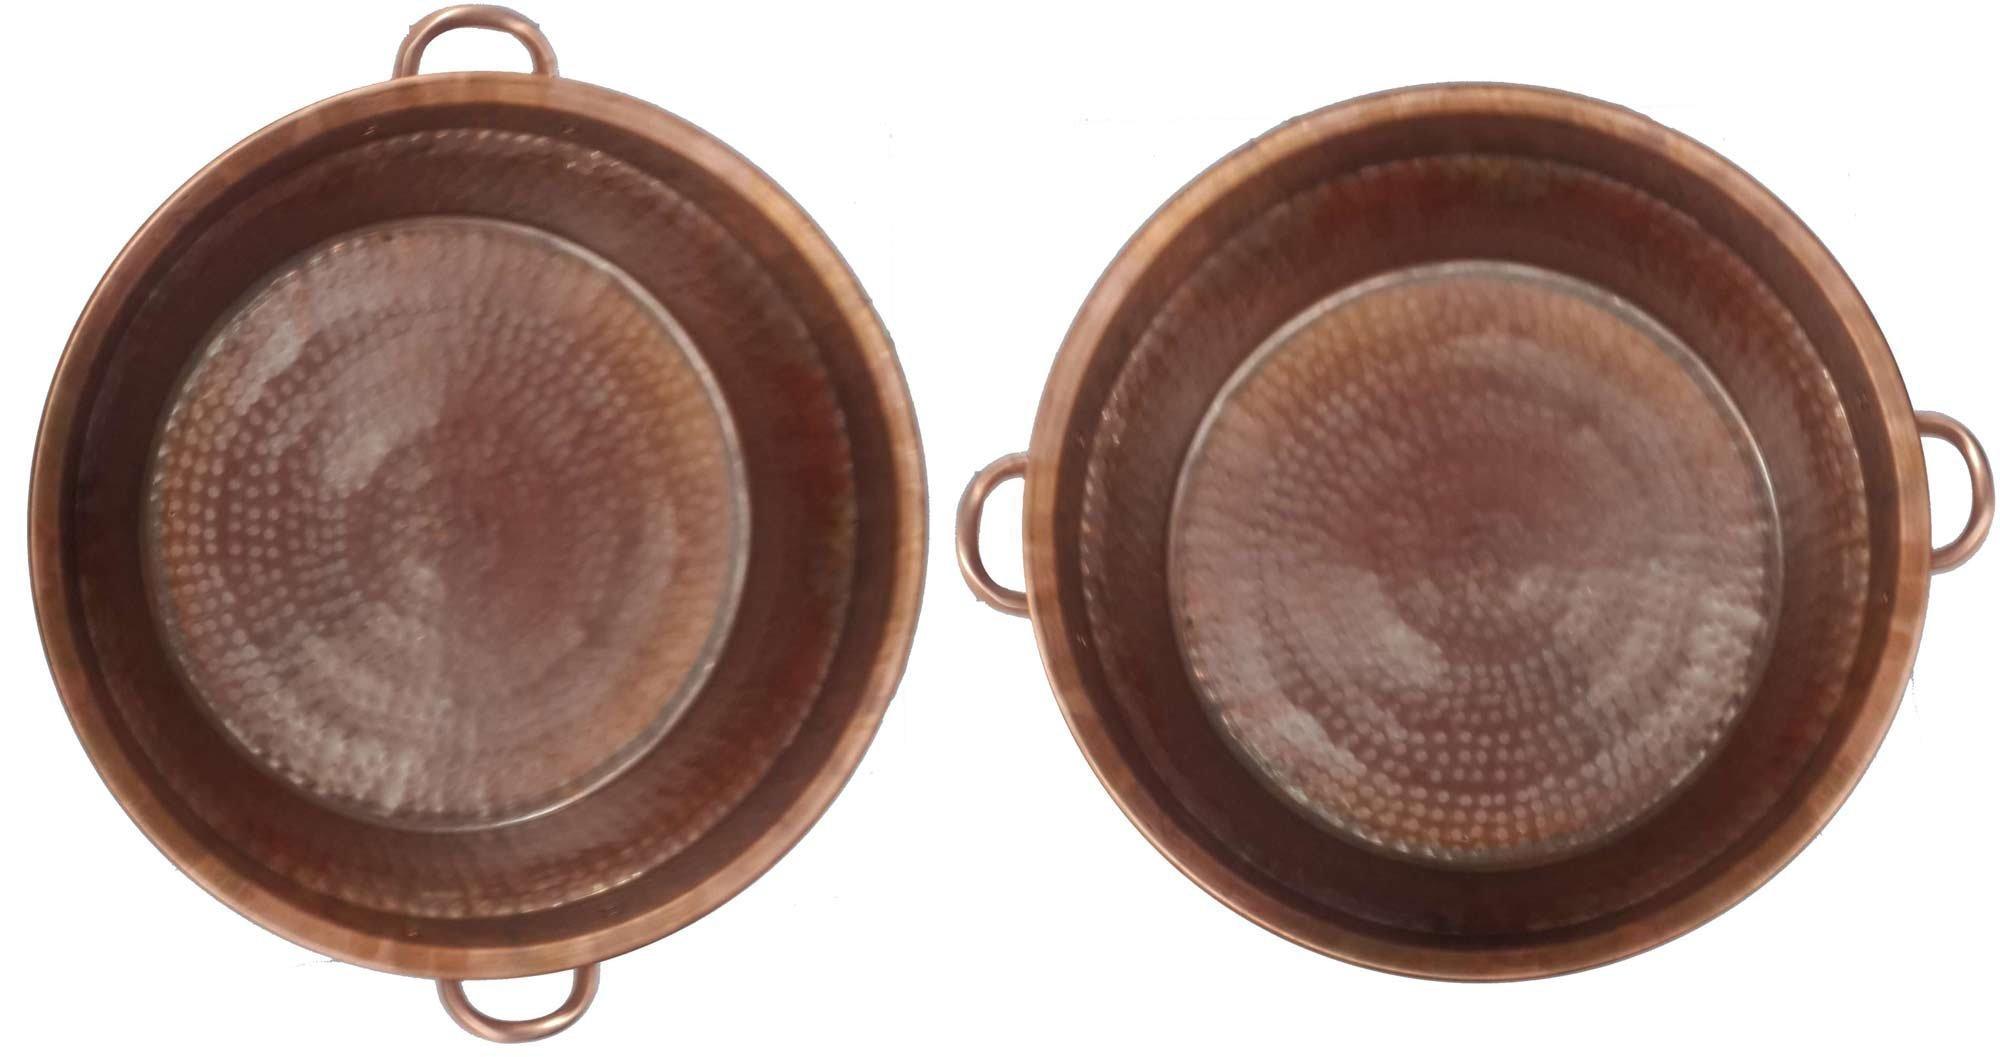 Egypt gift shops Pair Large Fire Burnt Massage Bath Buckets Handles Pedicure Spa Styling Salon Bowls 14'' Bottom by Egypt Gift Shops